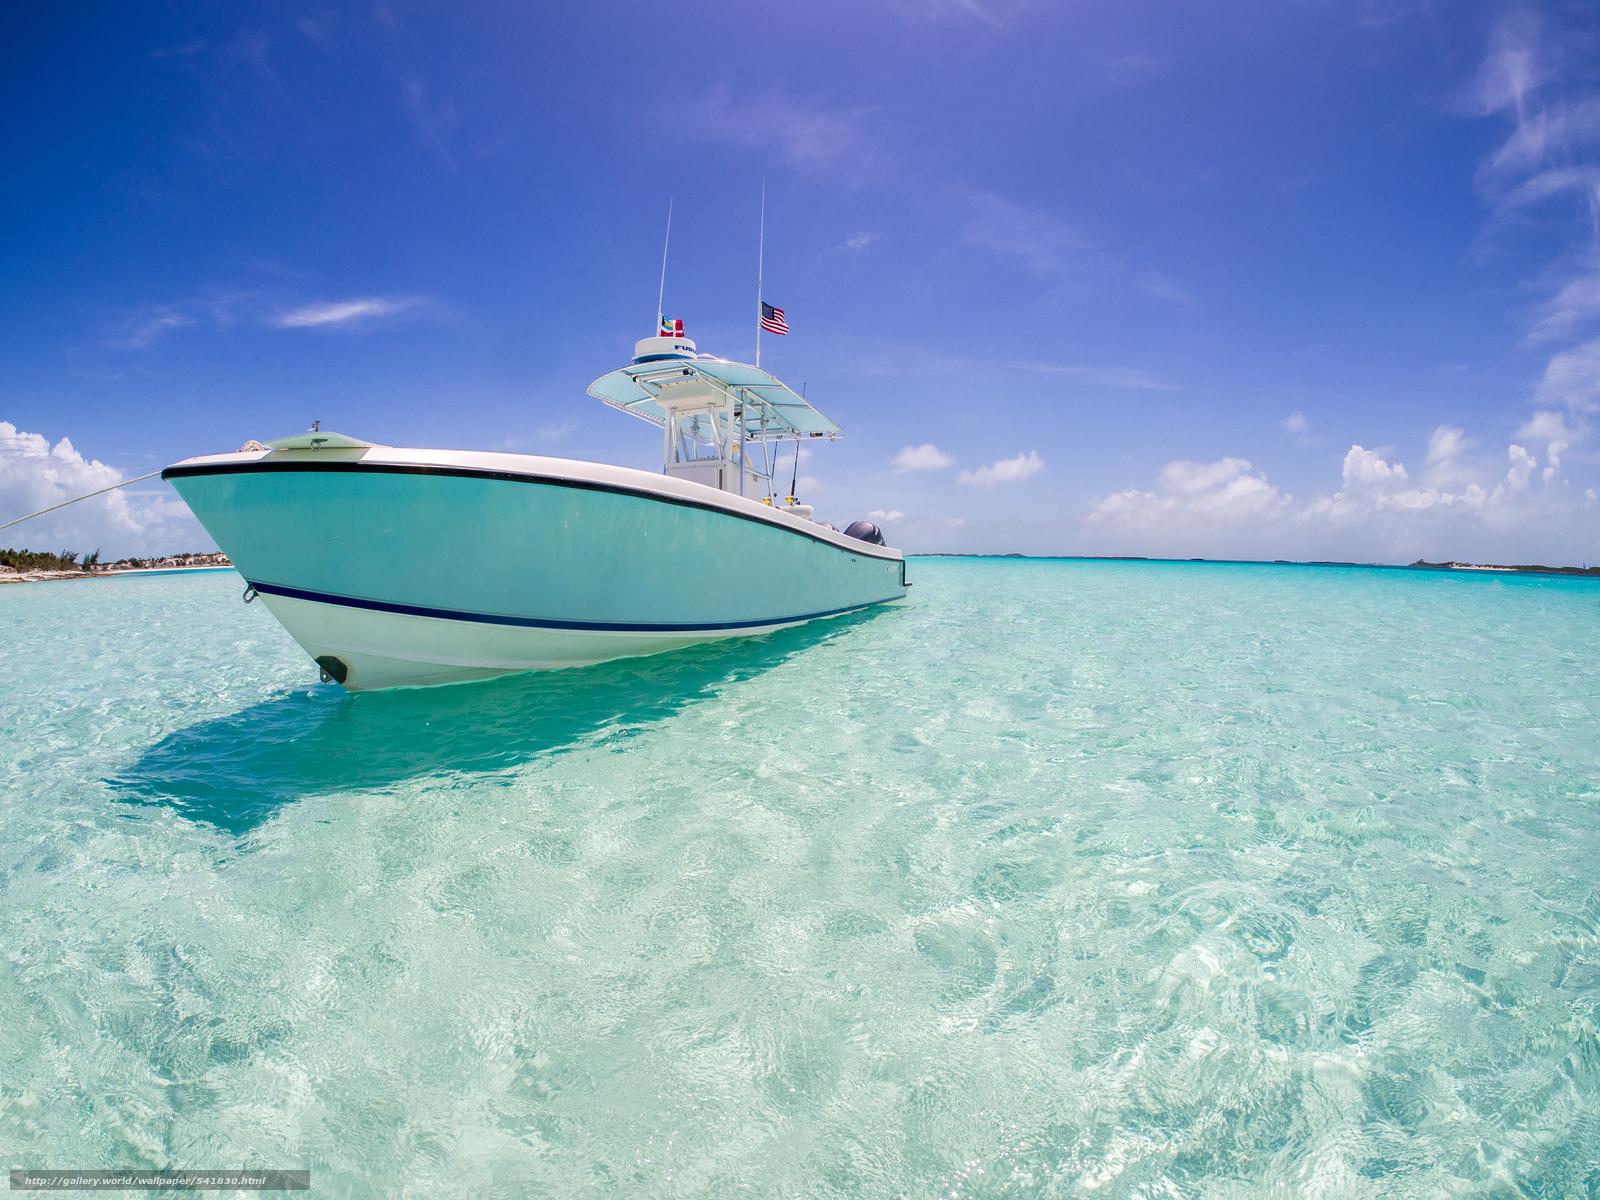 Download wallpaper yacht xhuma Islands Bahamas caribbean sea 1600x1200